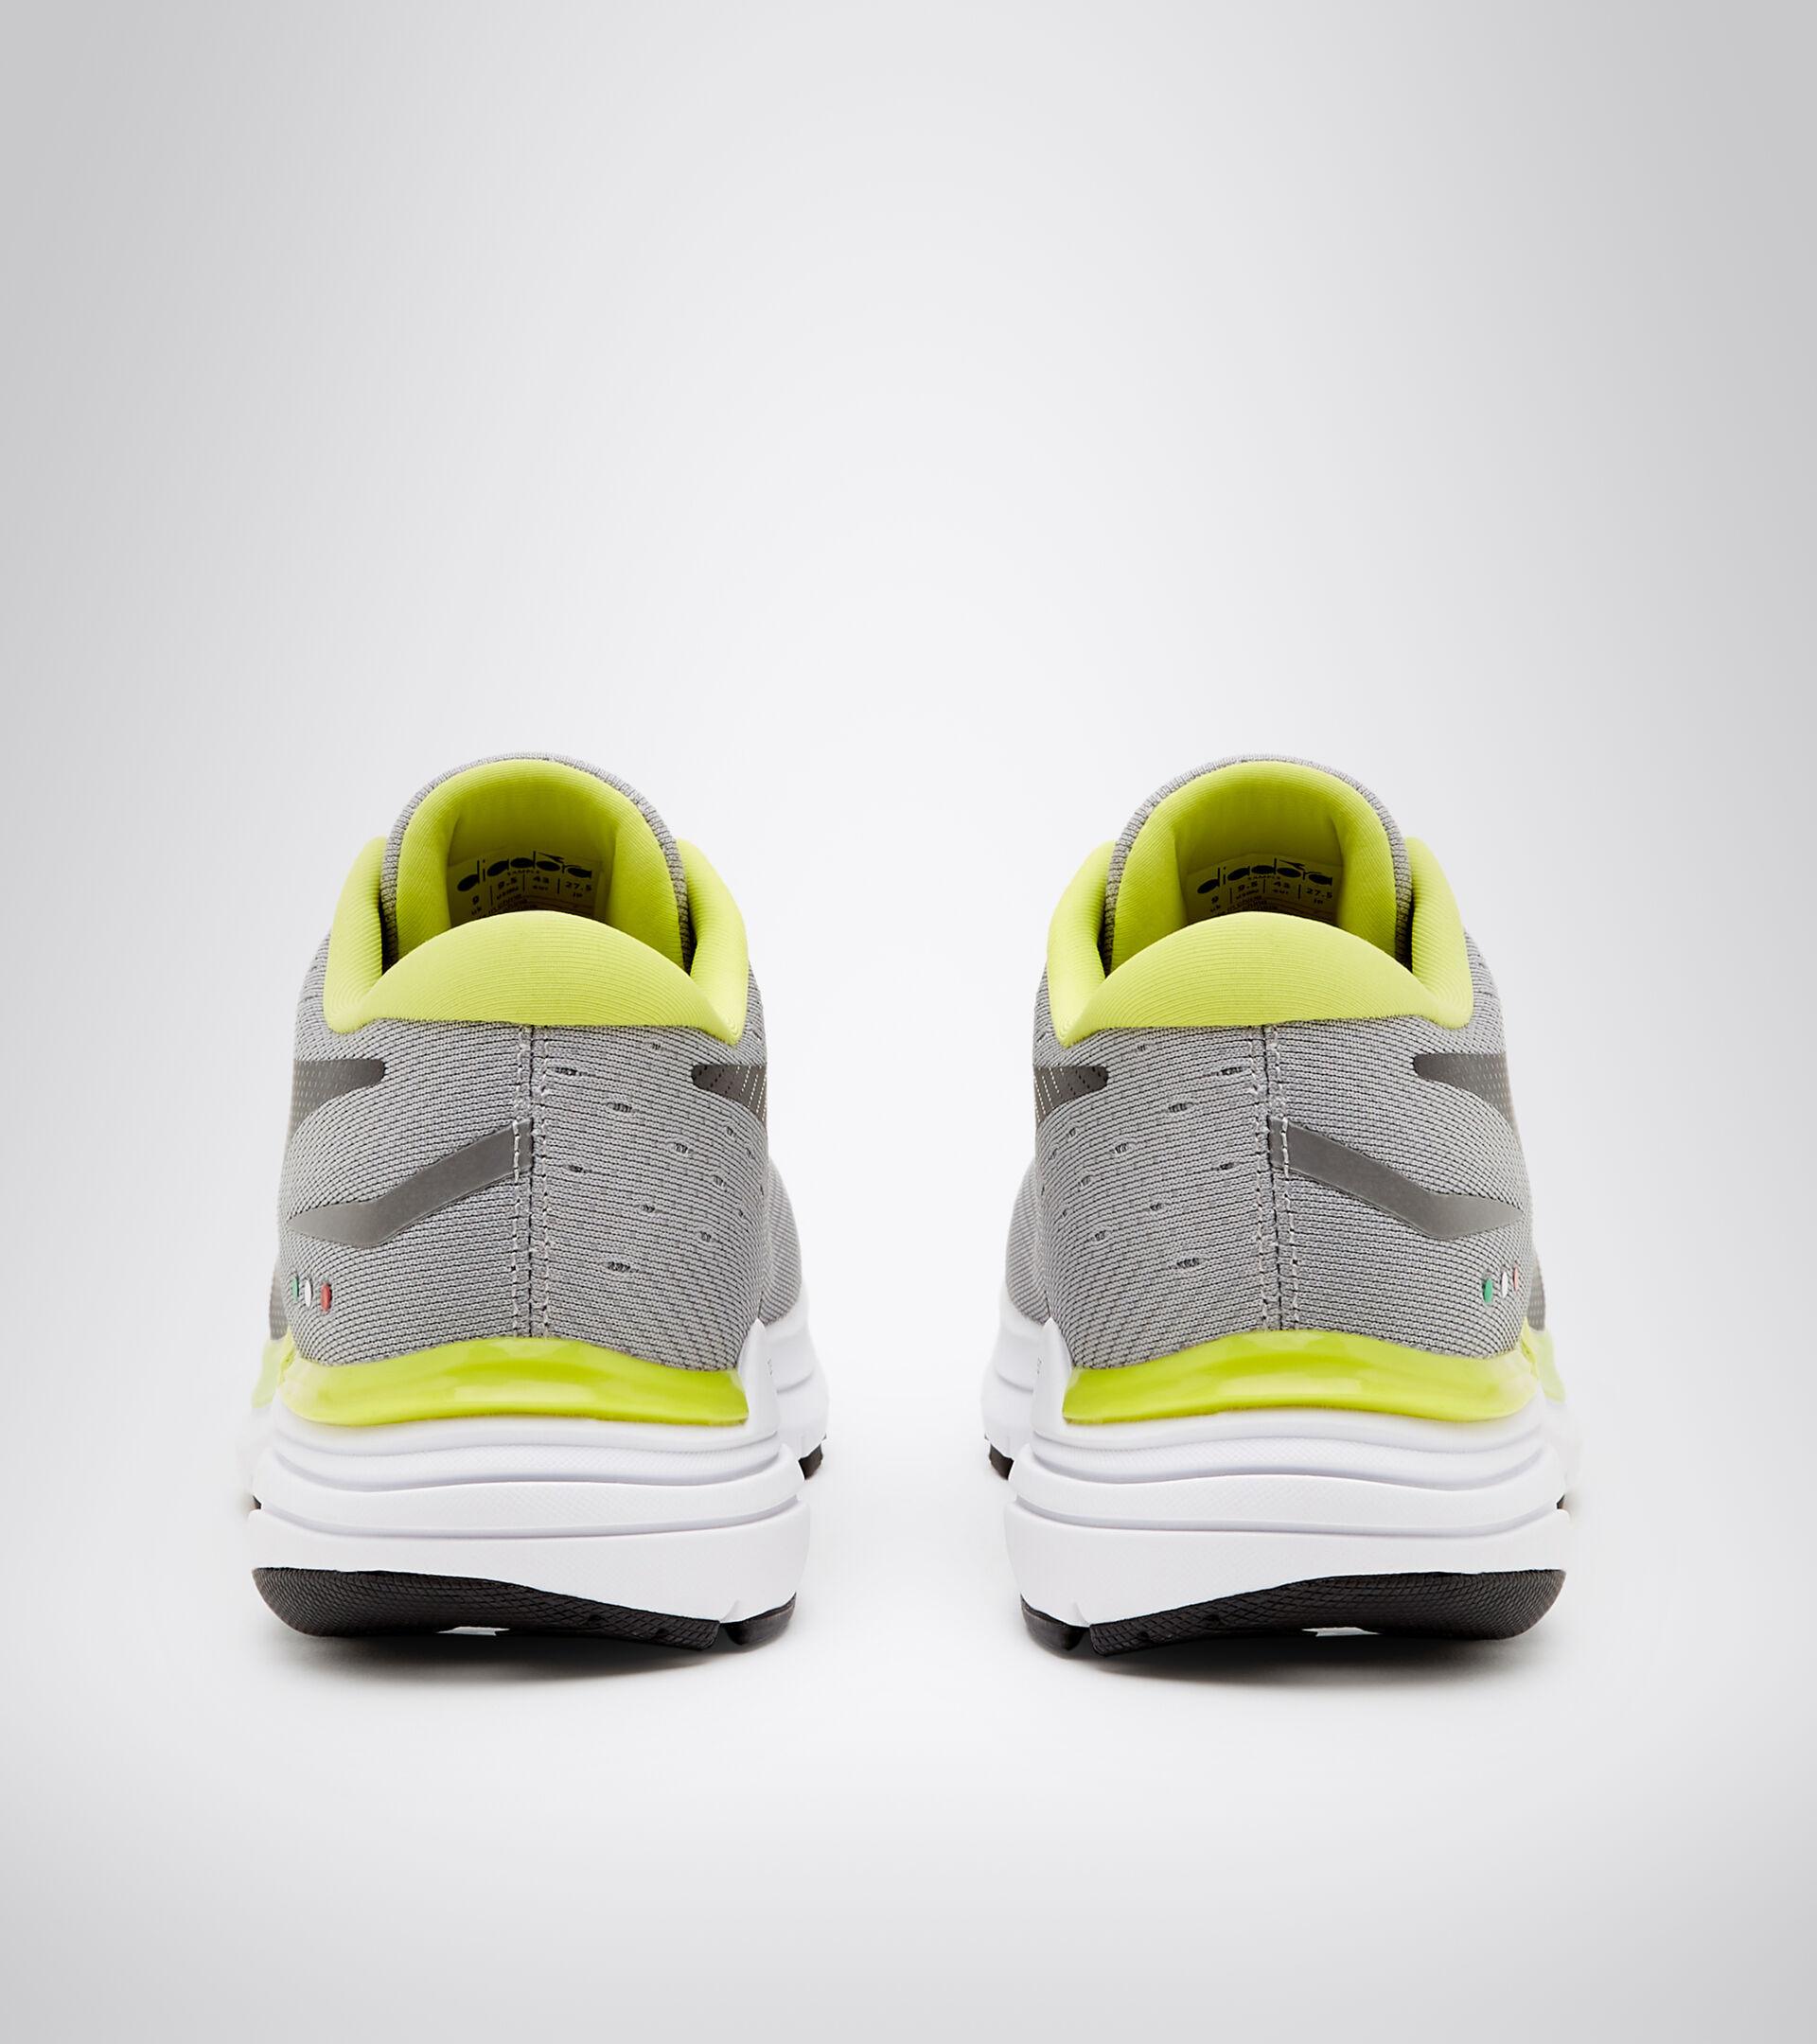 Footwear Sport UOMO MYTHOS BLUSHIELD 6 GRIGIO LEGA/GR ACCIAIO/NERO Diadora